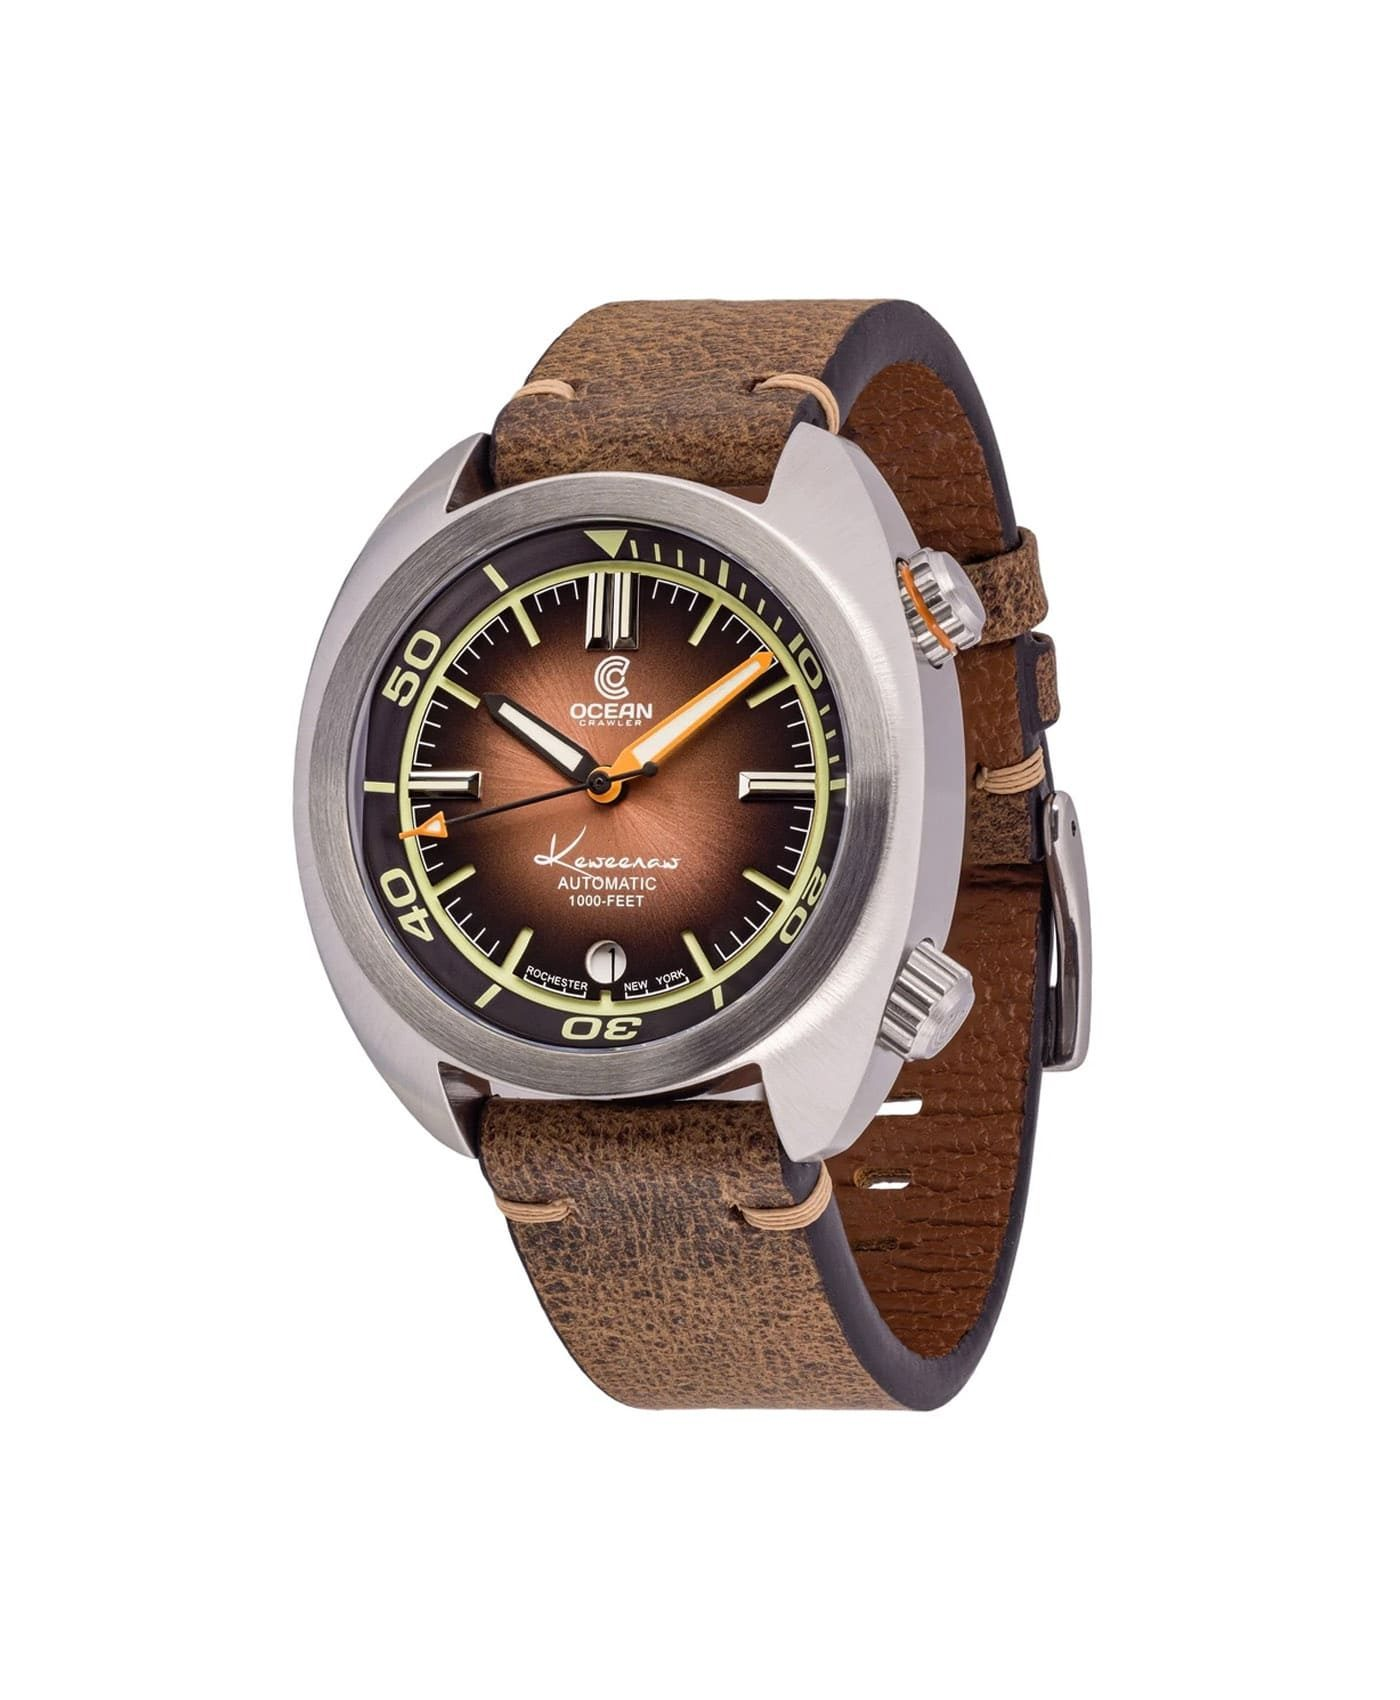 Ocean Crawler Great Lakes Diver Gradient Brown V2 leather strap